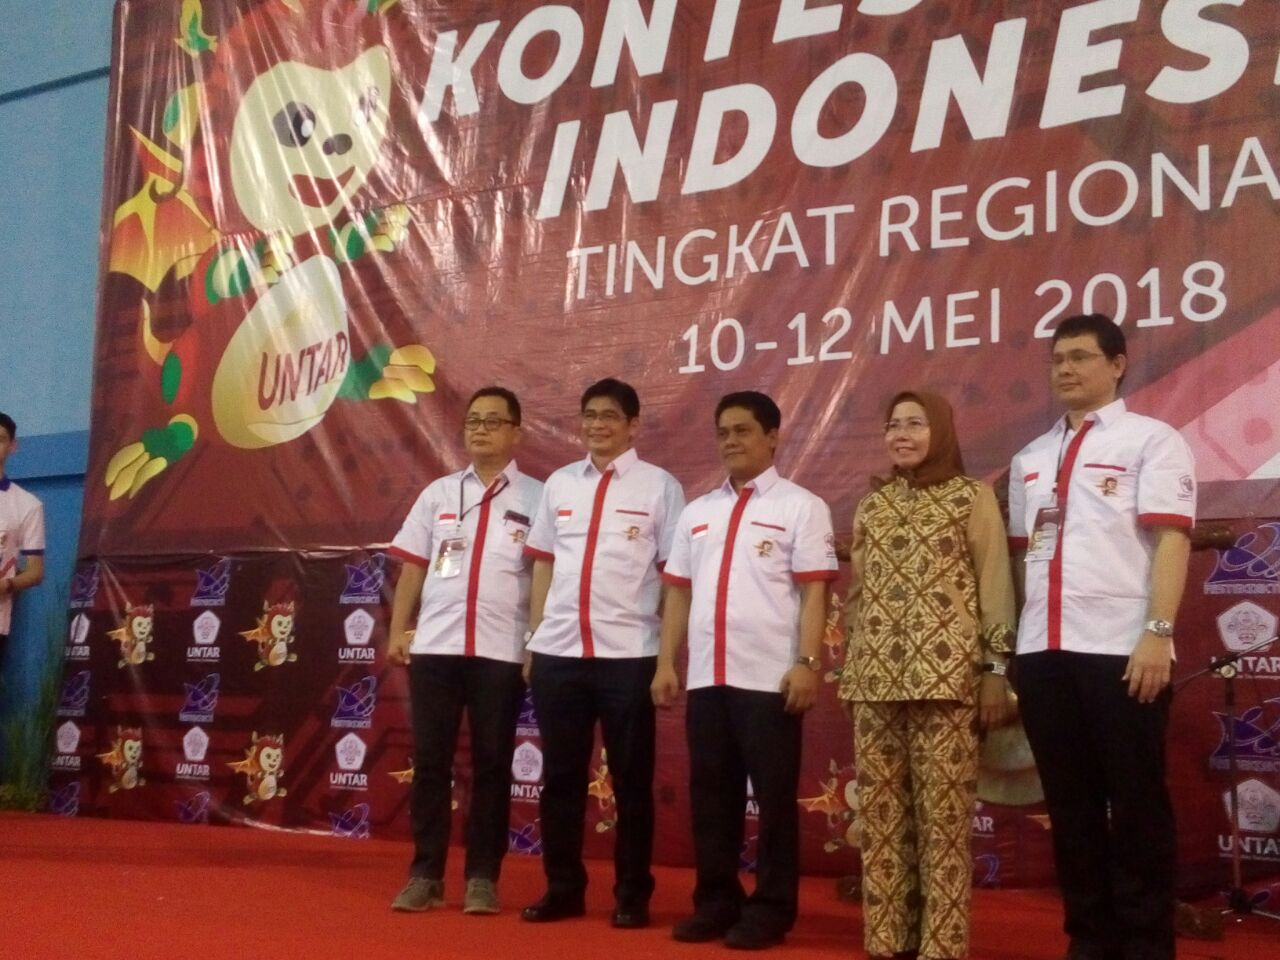 https: img.okezone.com content 2018 05 12 65 1897418 tuan-rumah-kontes-robot-indonesia-untar-dukung-pengembangan-sdm-menuju-industri-4-0-RMITLUqCZy.jpeg